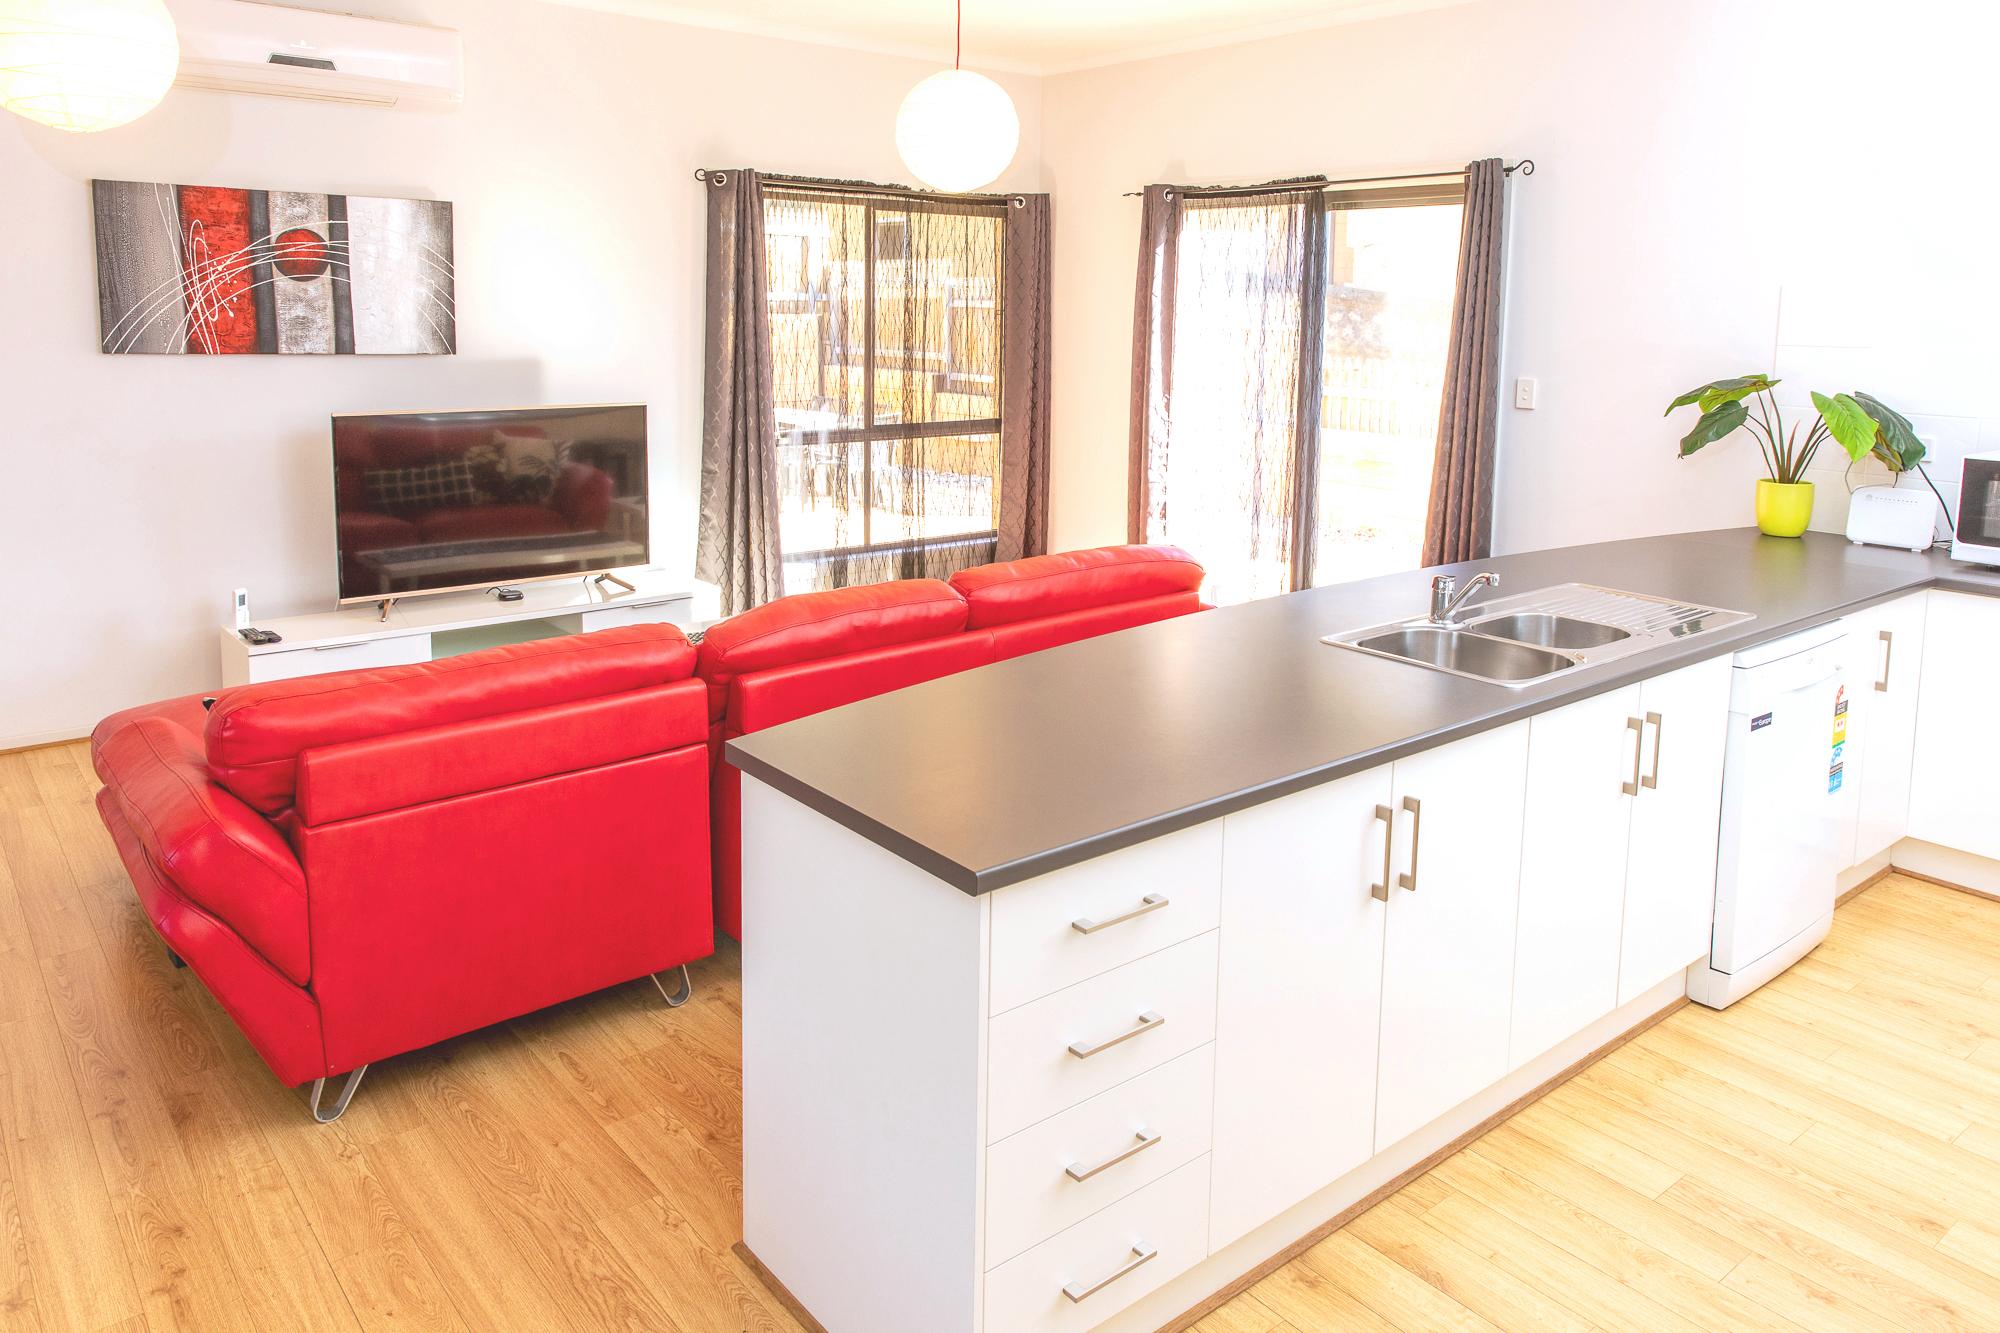 Riverview Gawler Kitchen & Living